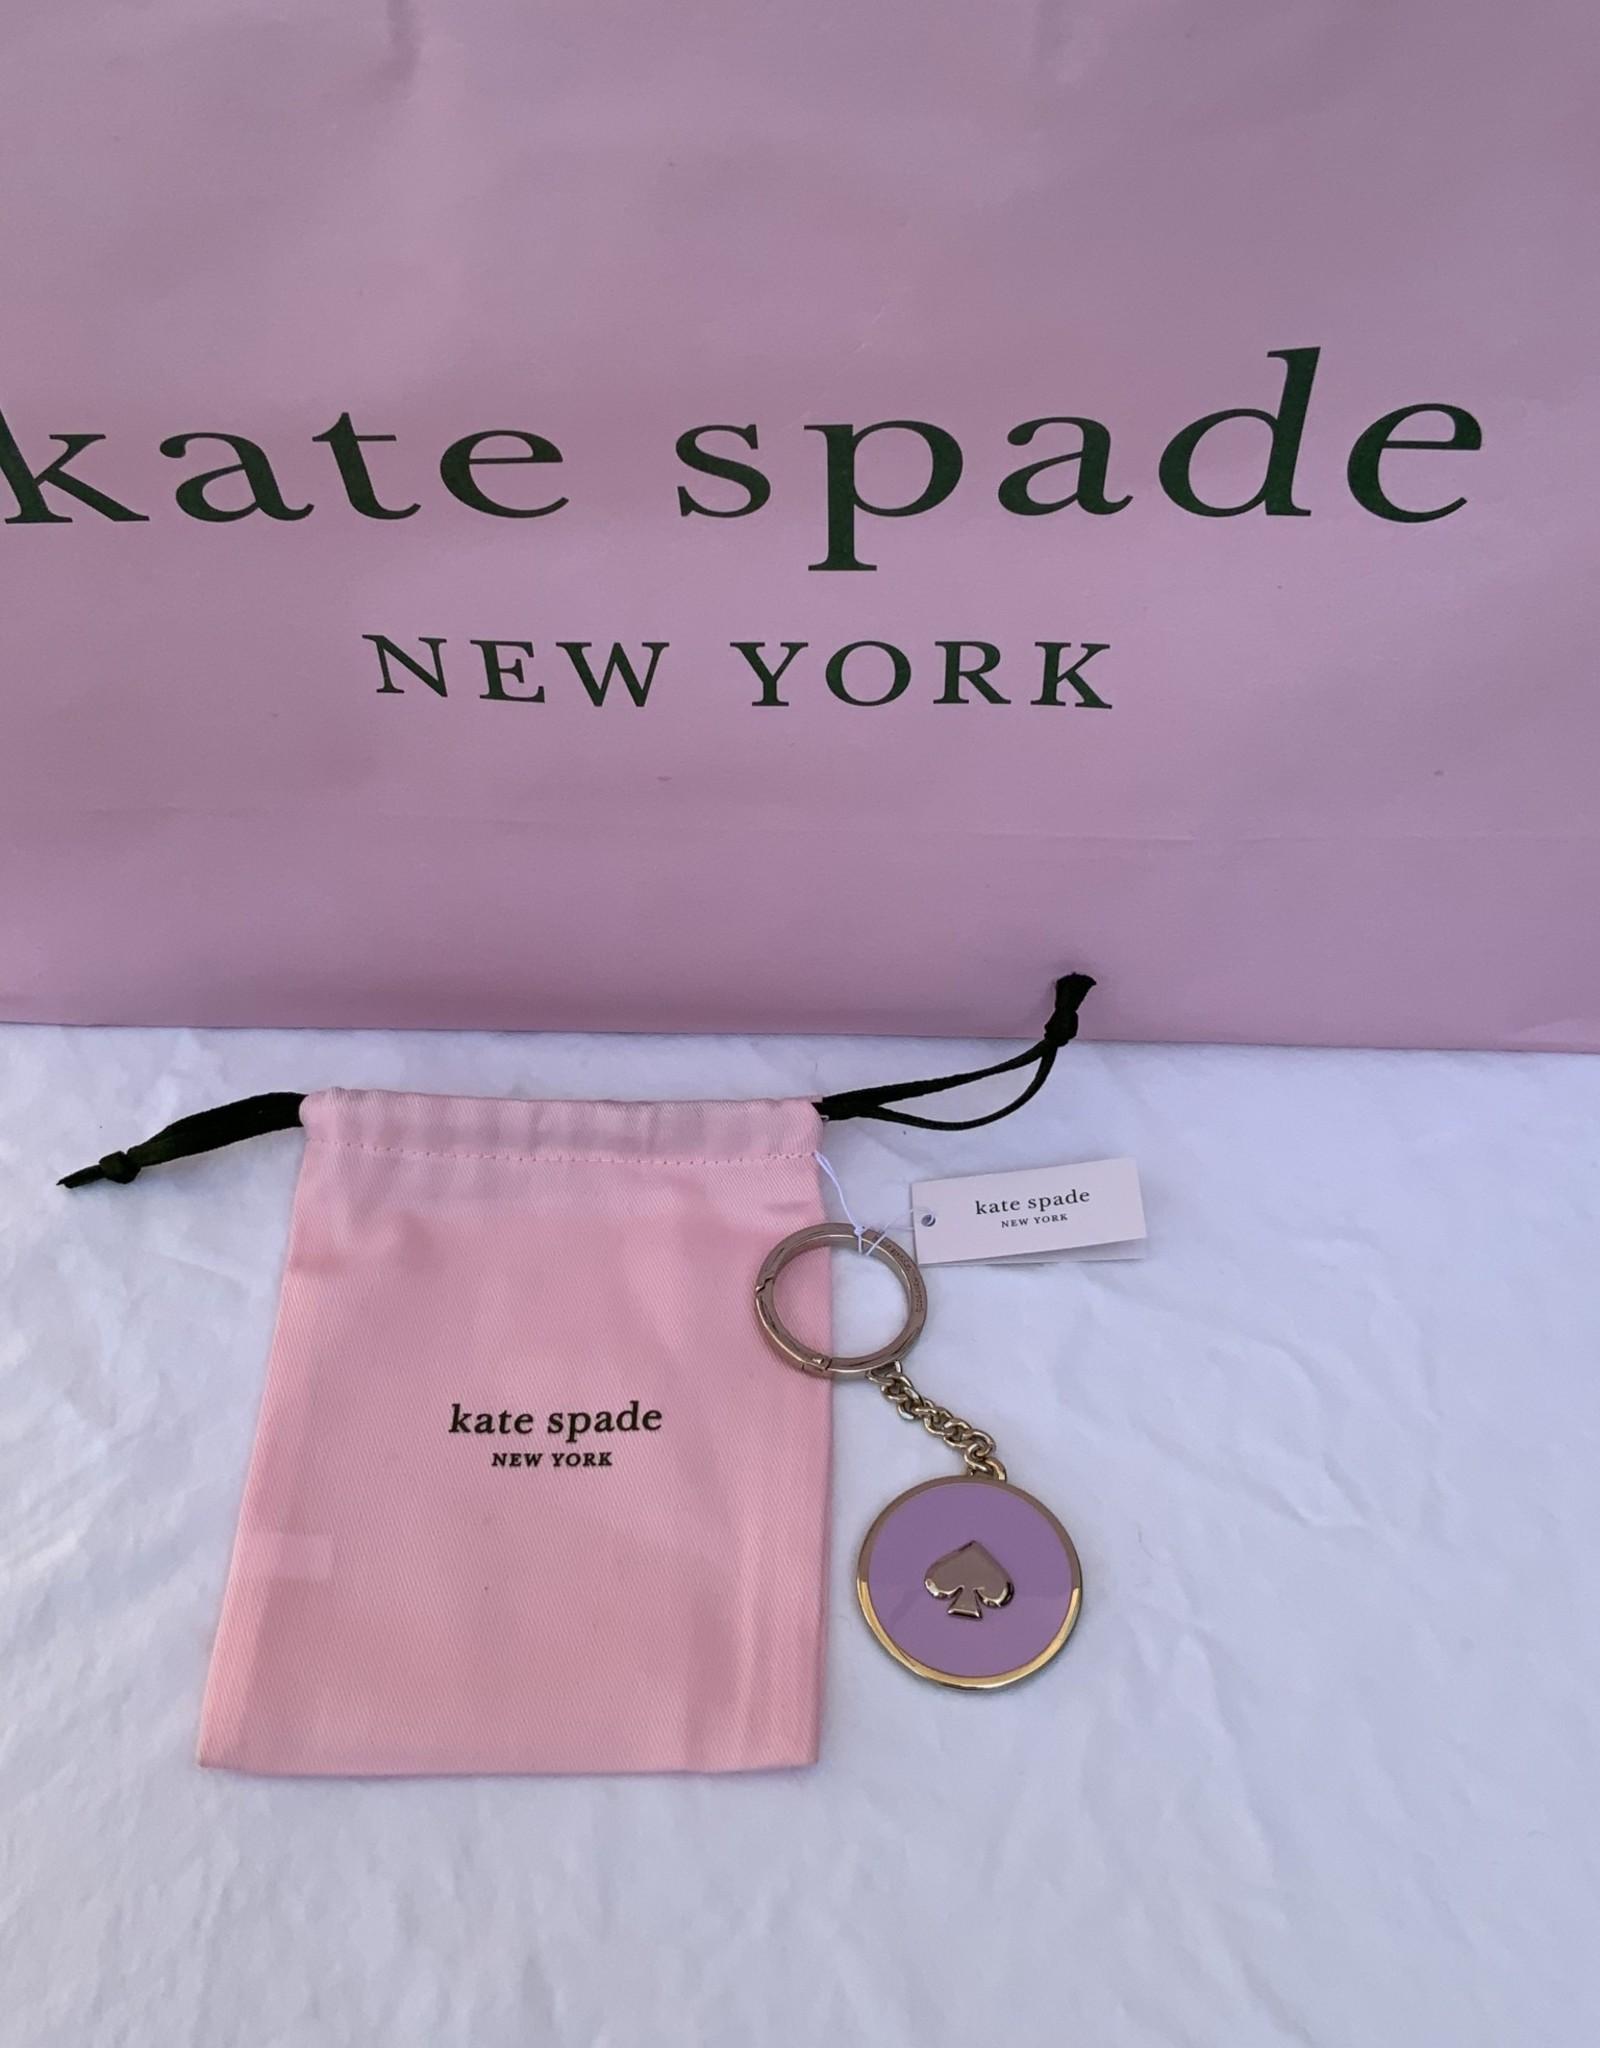 Kate Spade Kate Spade Charm